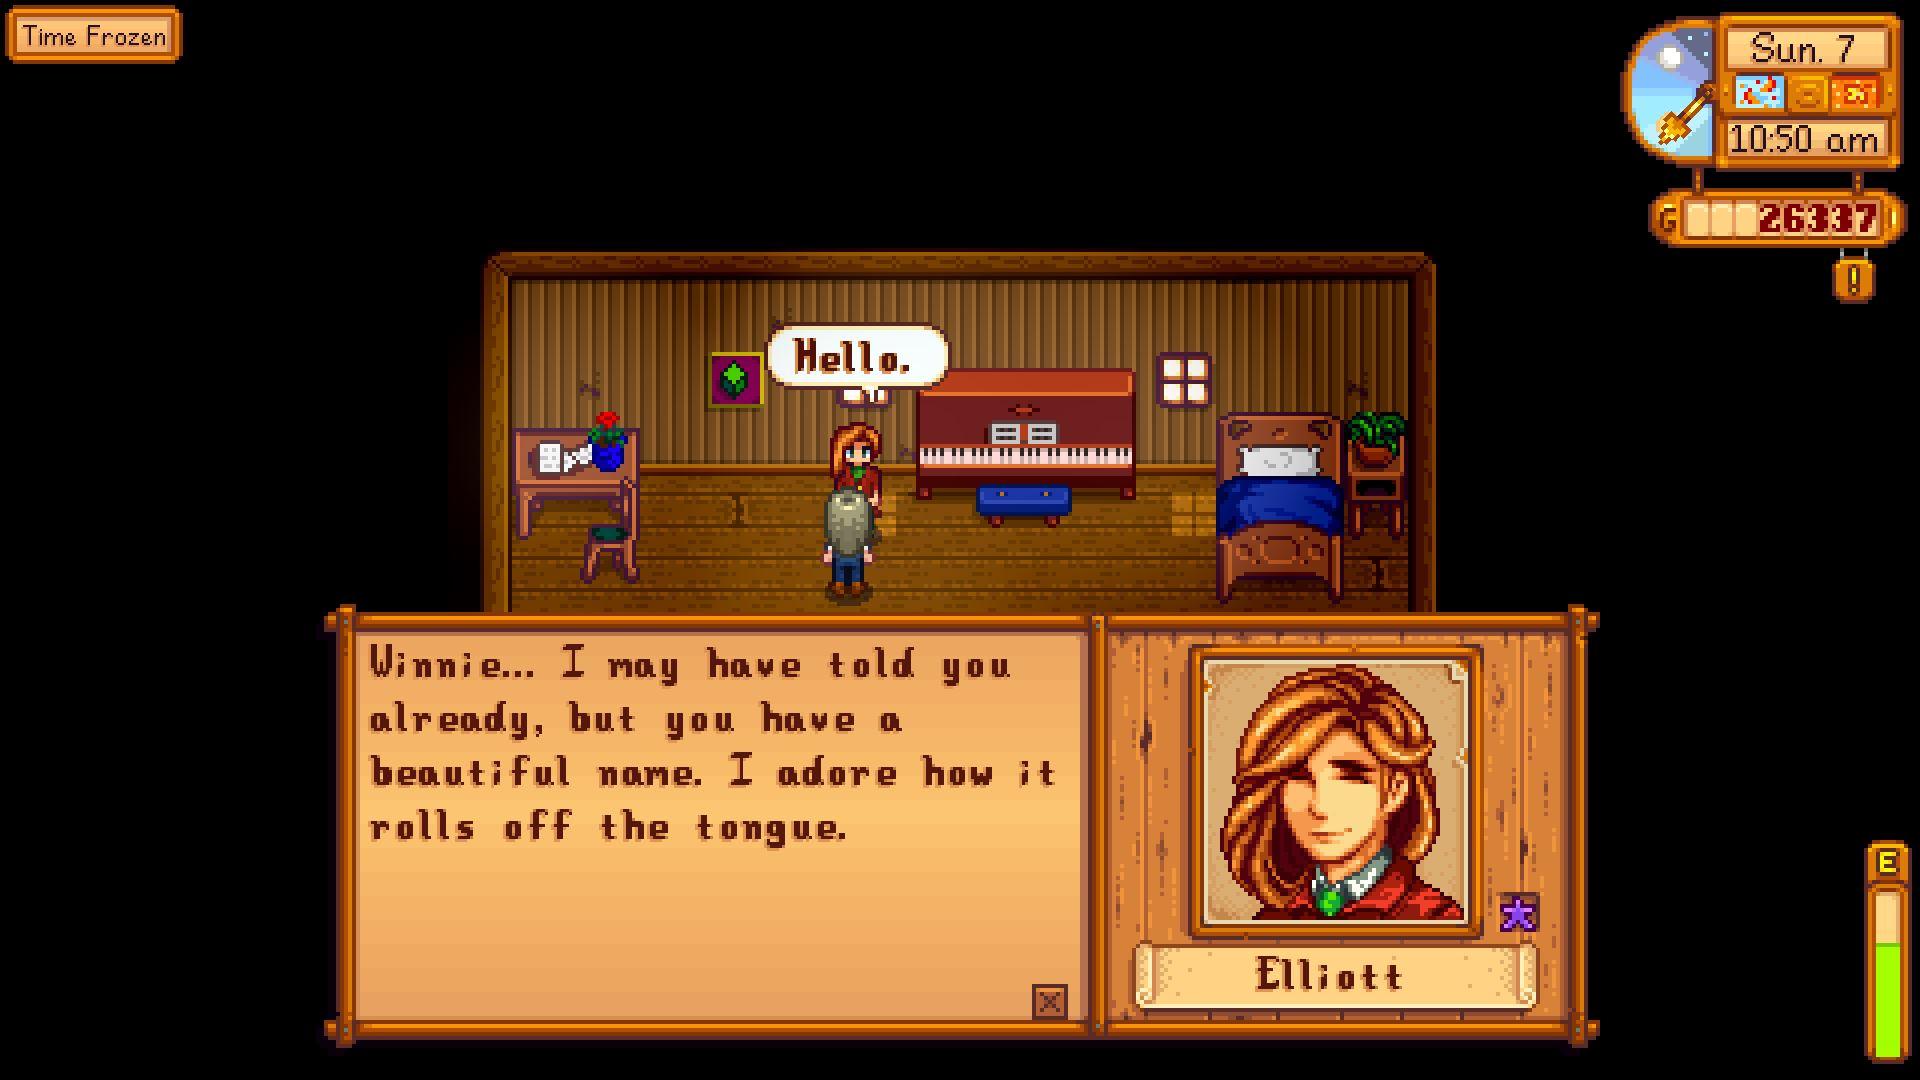 elliot_example2.JPG